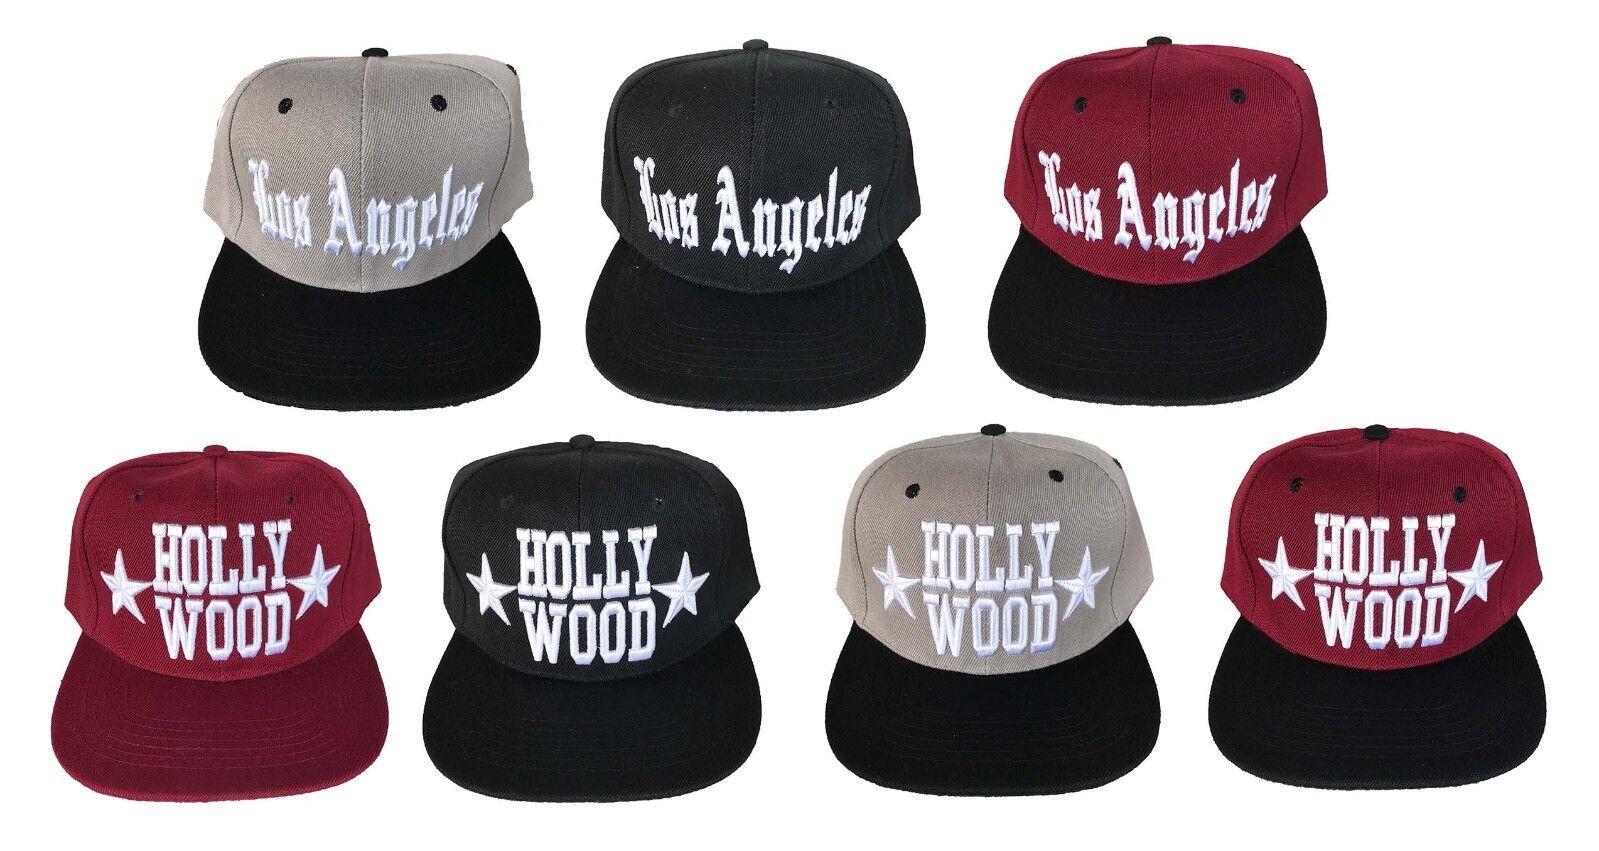 Los Angeles 3D EMBROIDERED LOGO FLAT BILL CAP SNAPBACK BASEBALL HAT CAP BILL 860f43